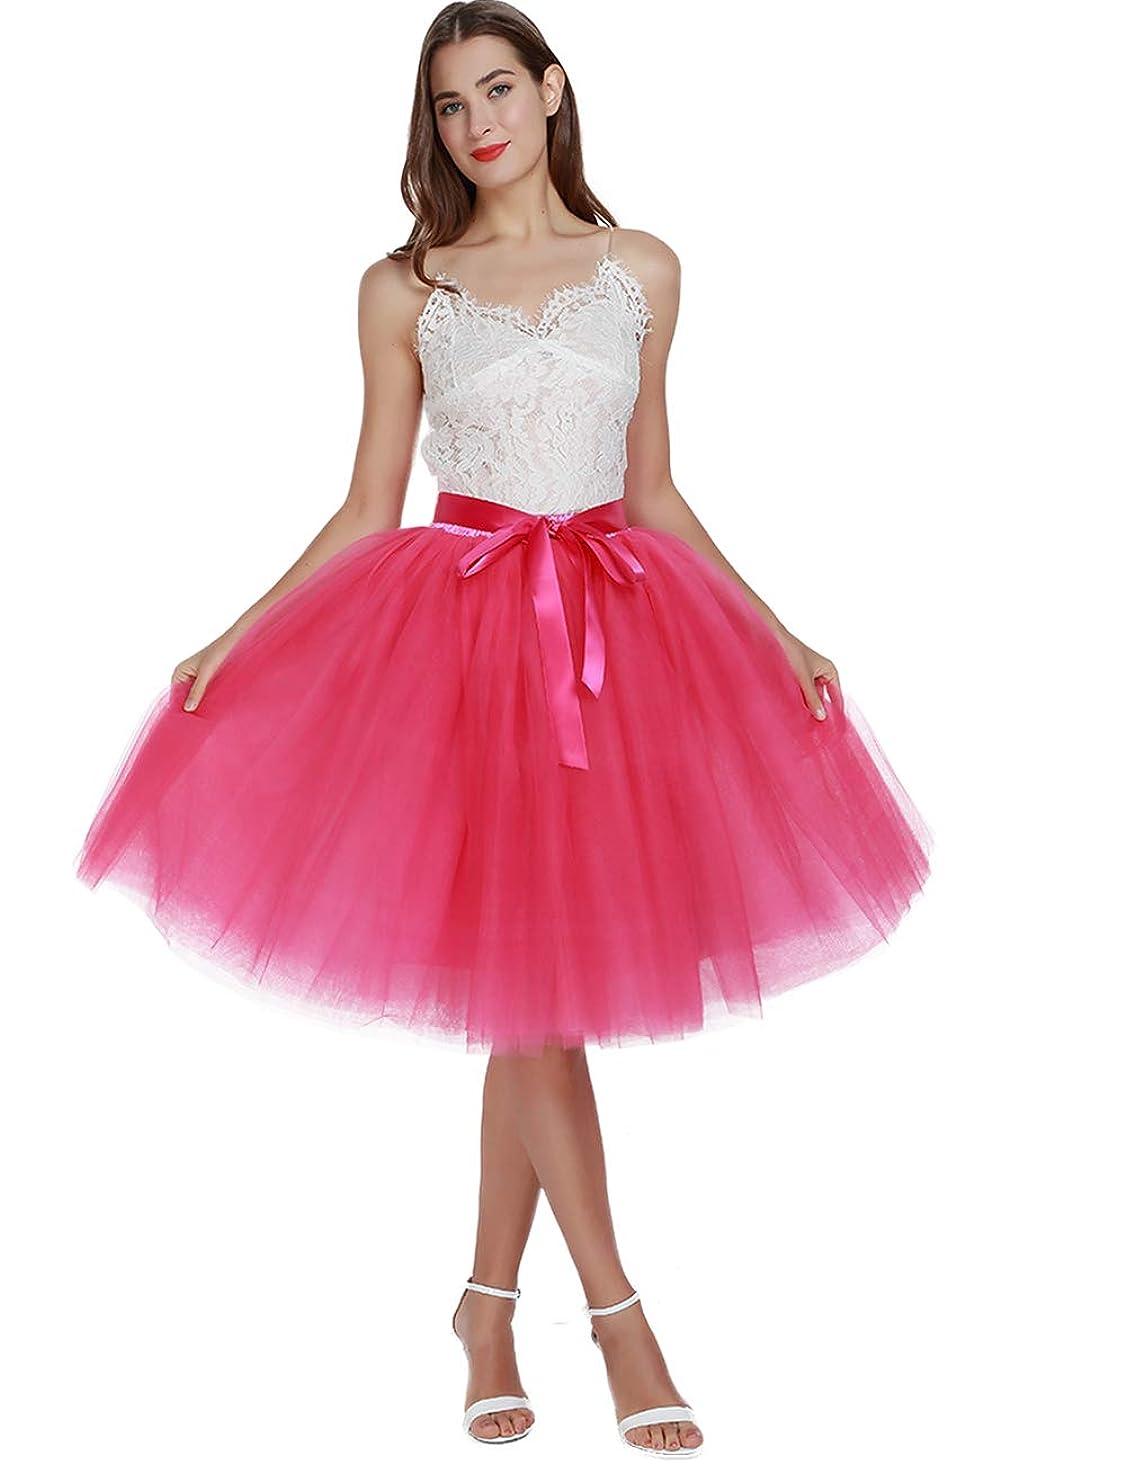 Women's High Waist Pleated Princess A Line Midi/Knee Length Tutu Tulle Skirt for Prom Party